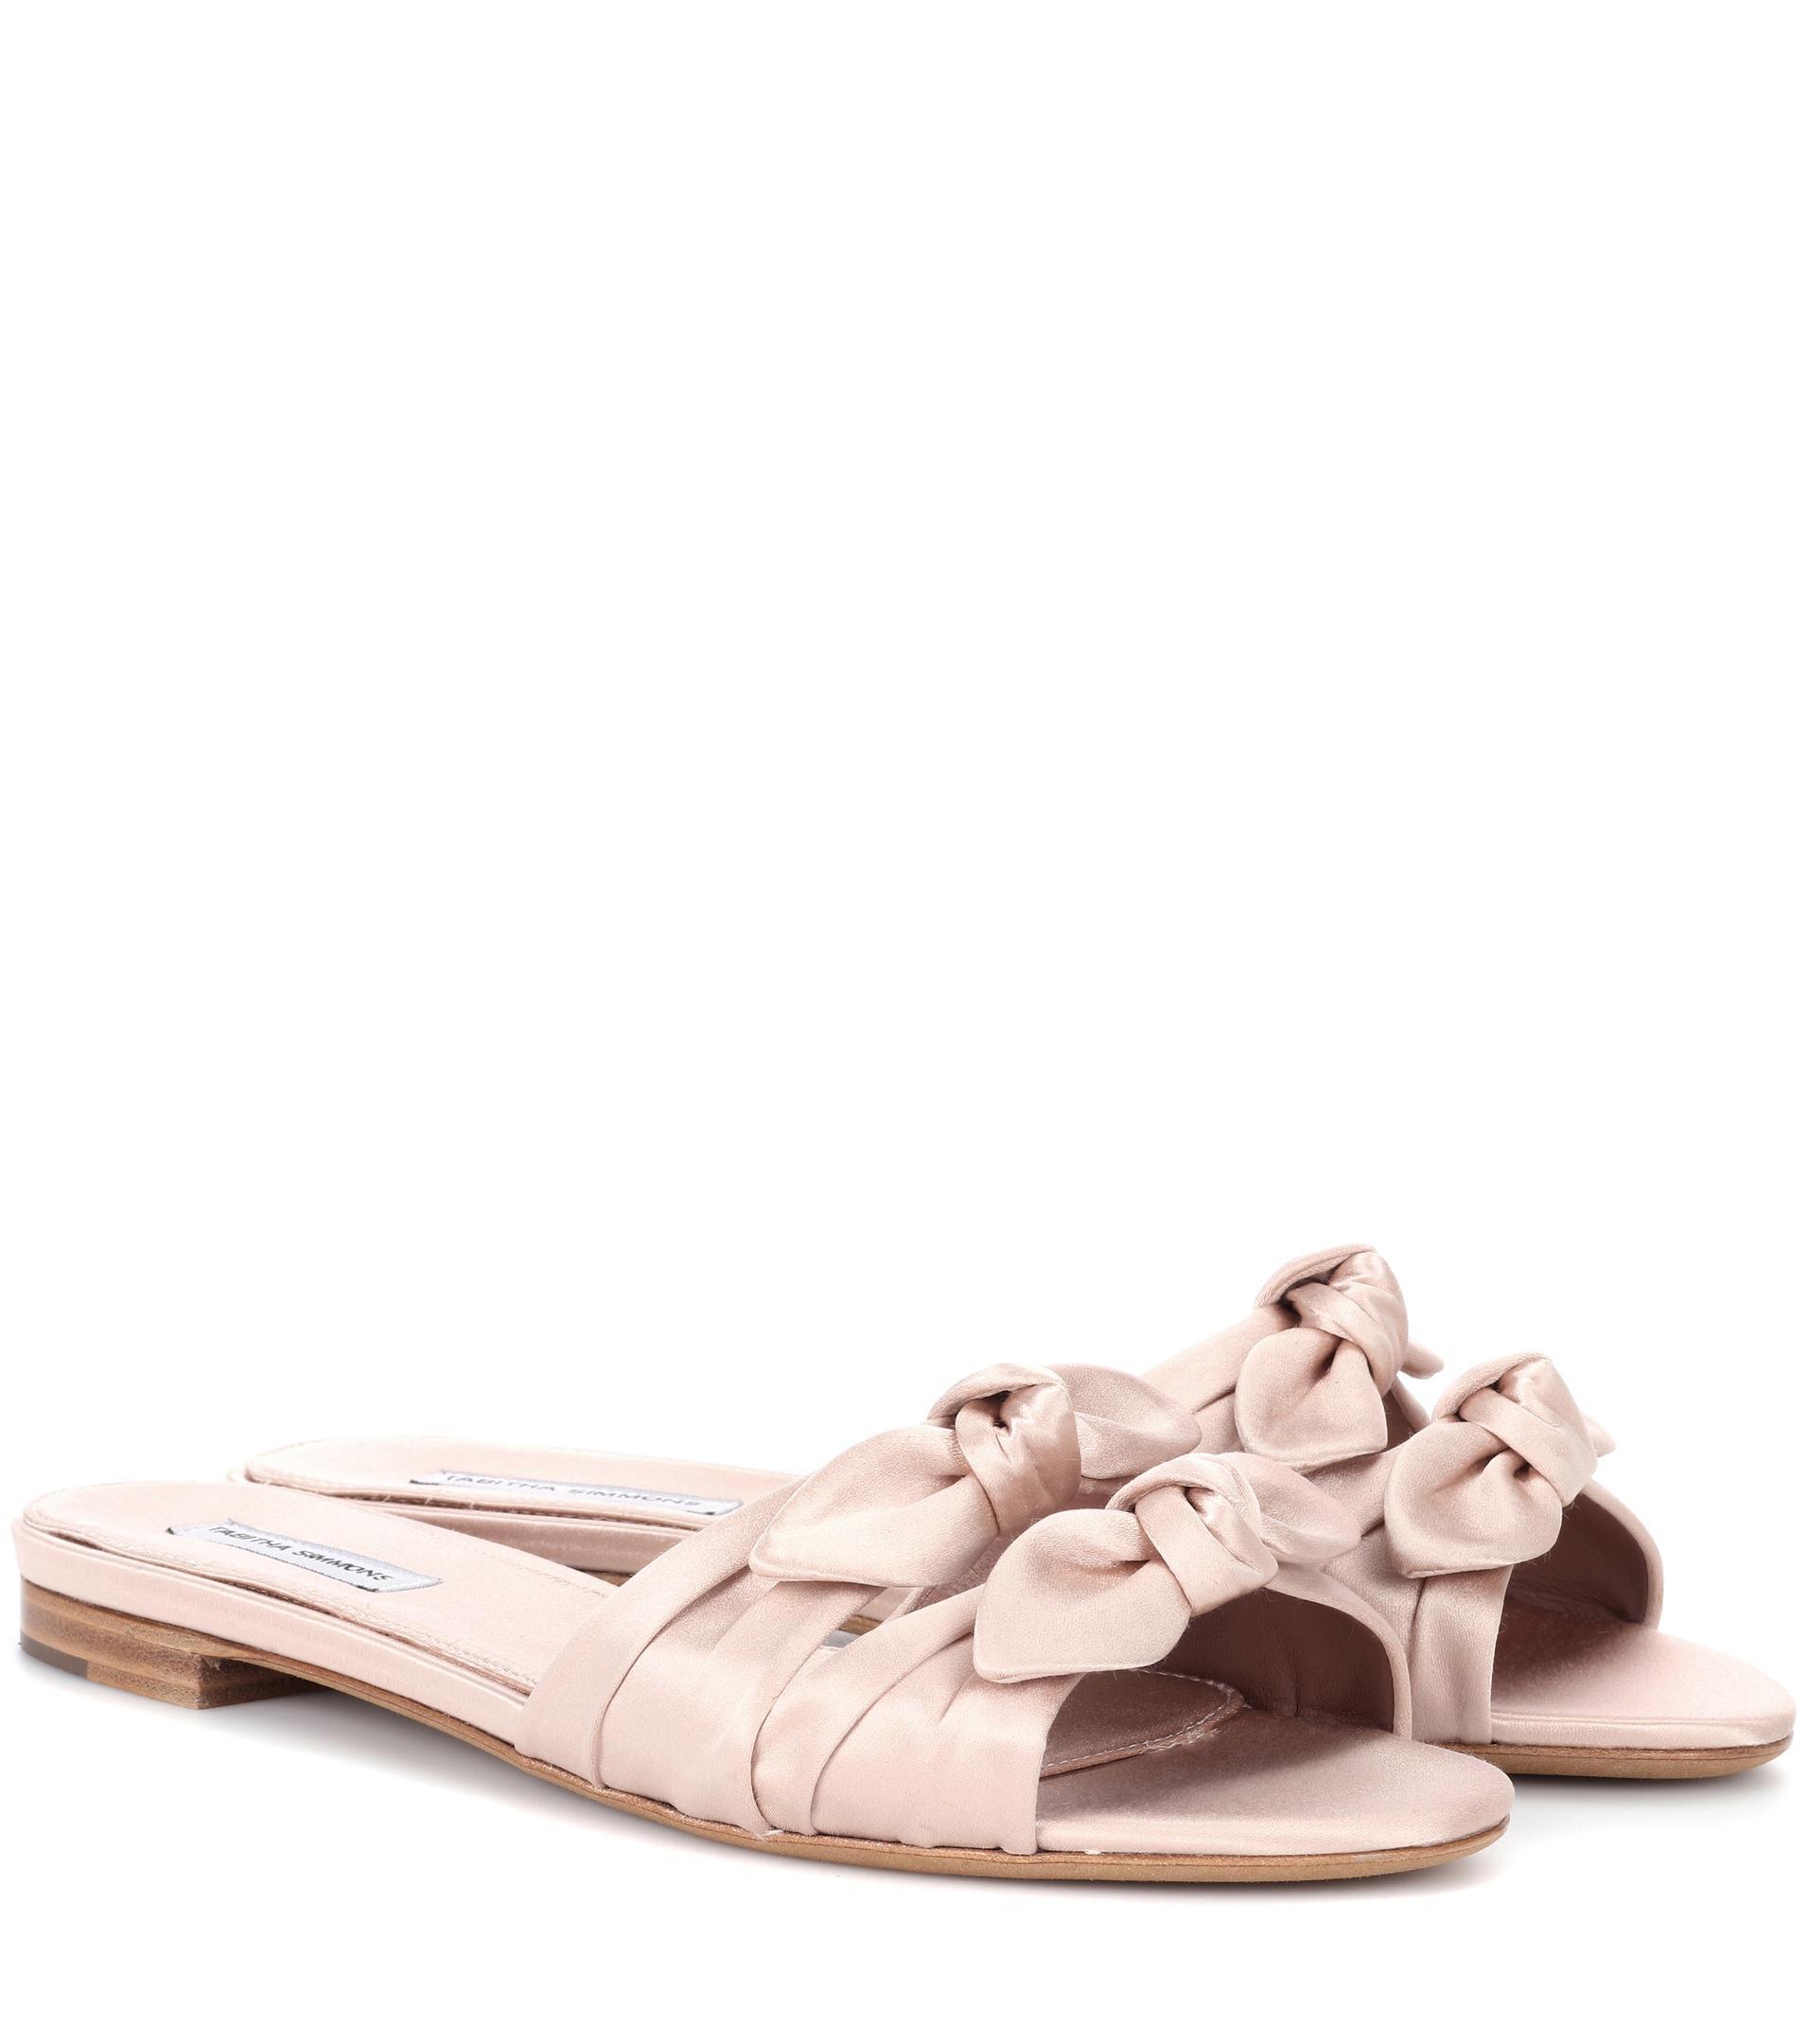 Sandales En Satin Cleo Tabitha Simmons 0OOxKeHCY